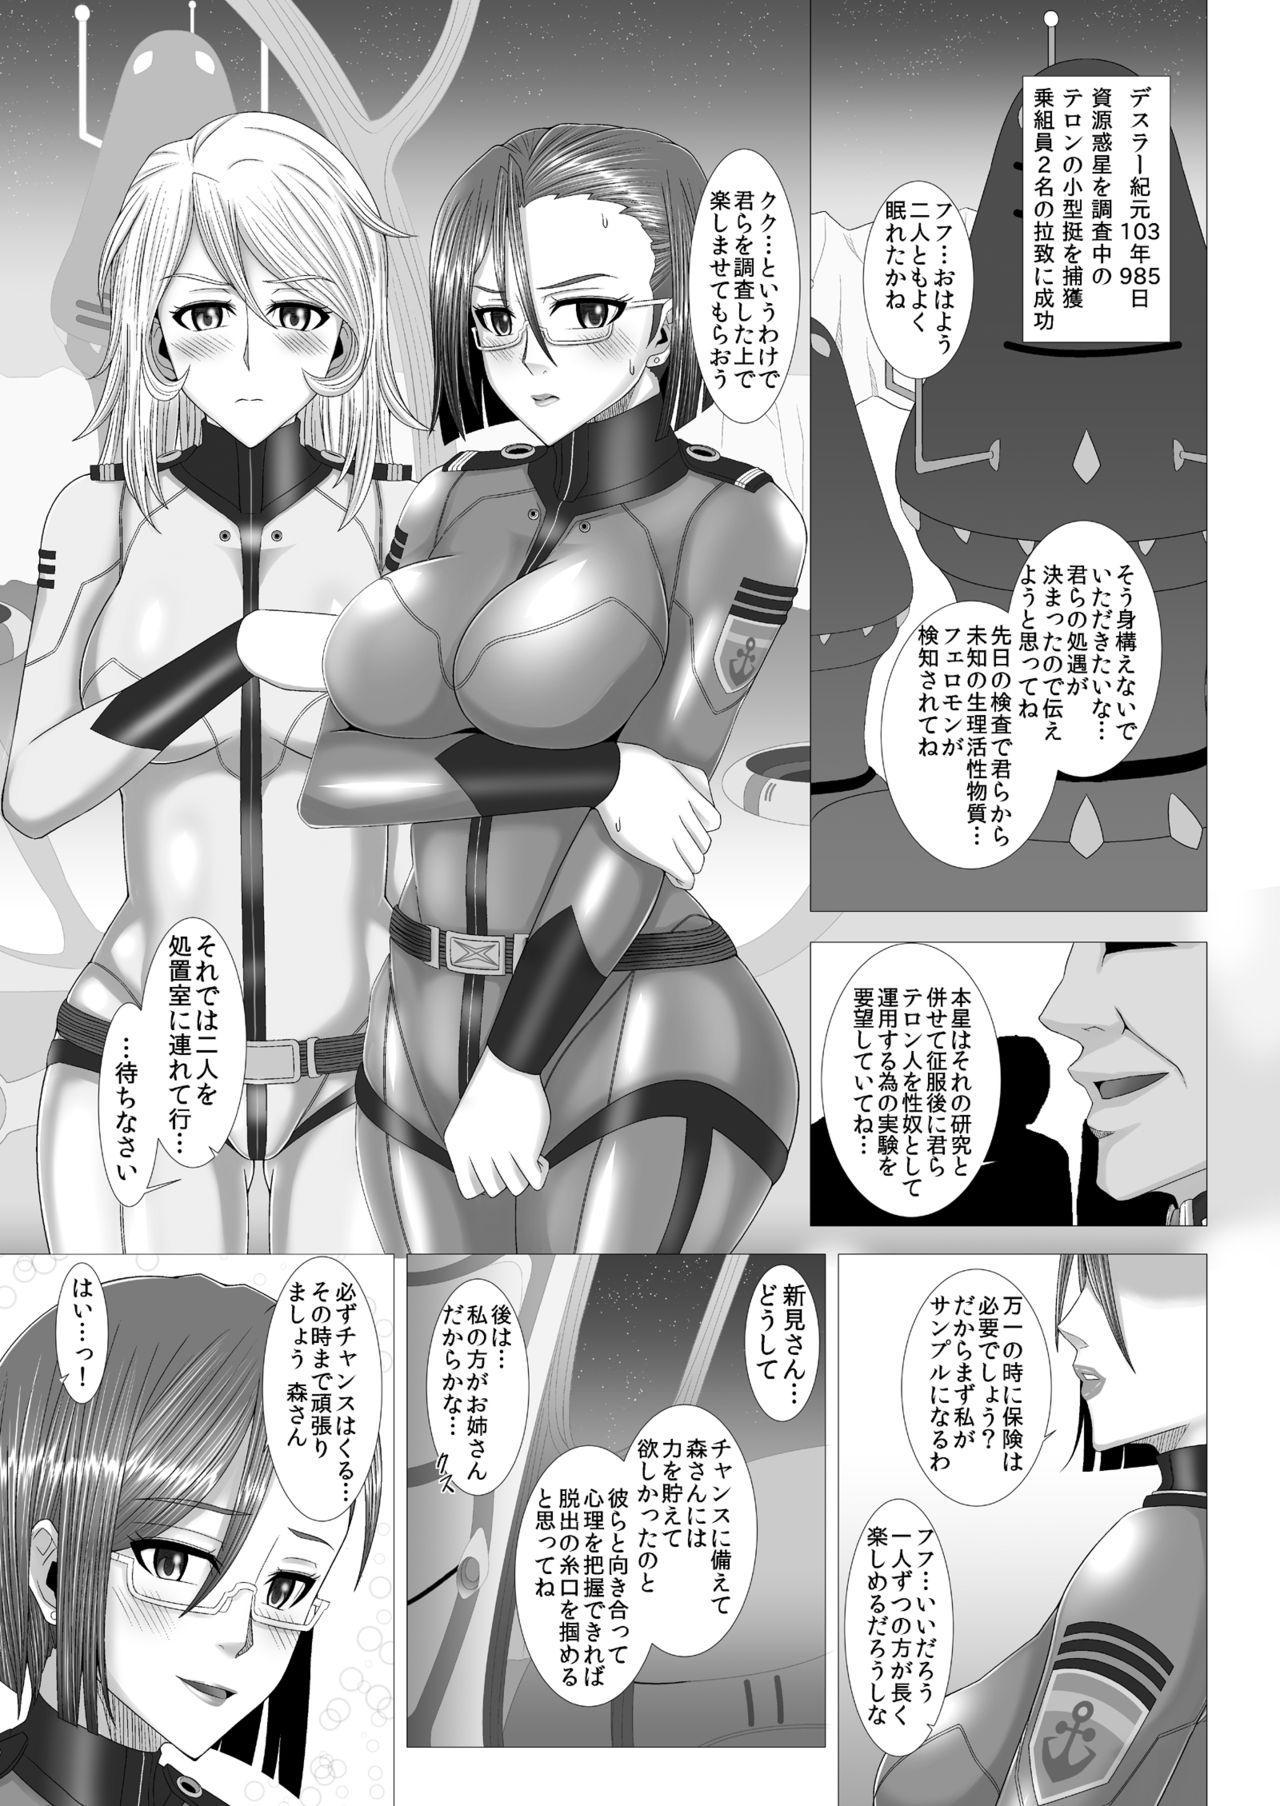 Kusurizuke! Sennou! Kikai Kaizou! Kuroochi Bitch-ka Heroine +α 91